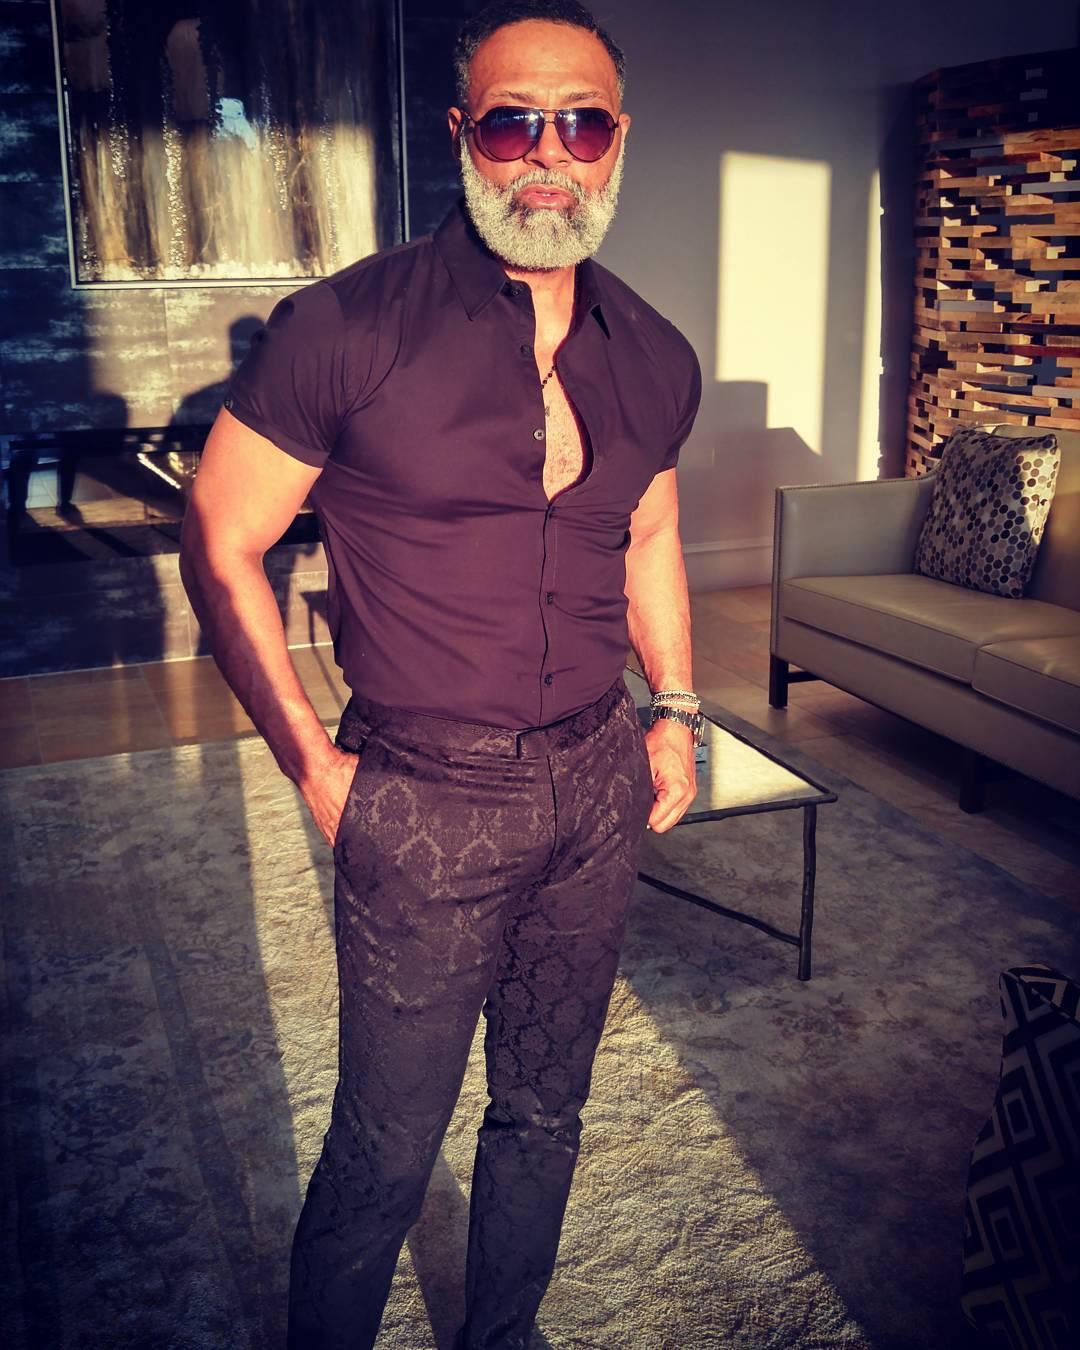 most-stylish-grandpas-on-the-internet-03